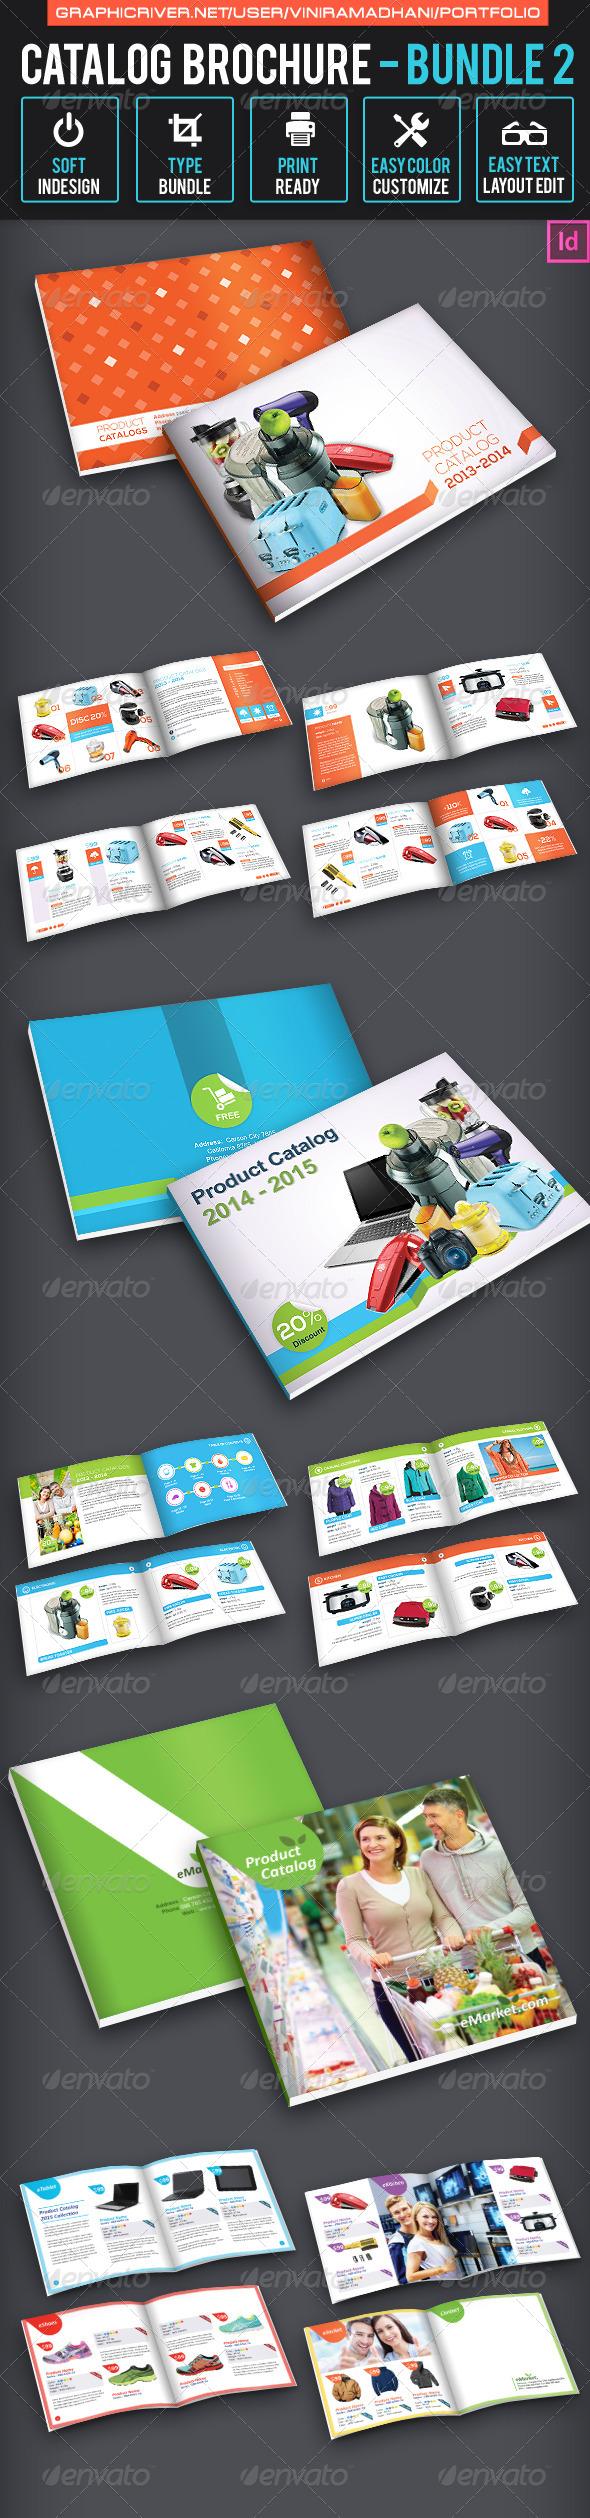 GraphicRiver Catalog Brochure Bundle 2 7094955